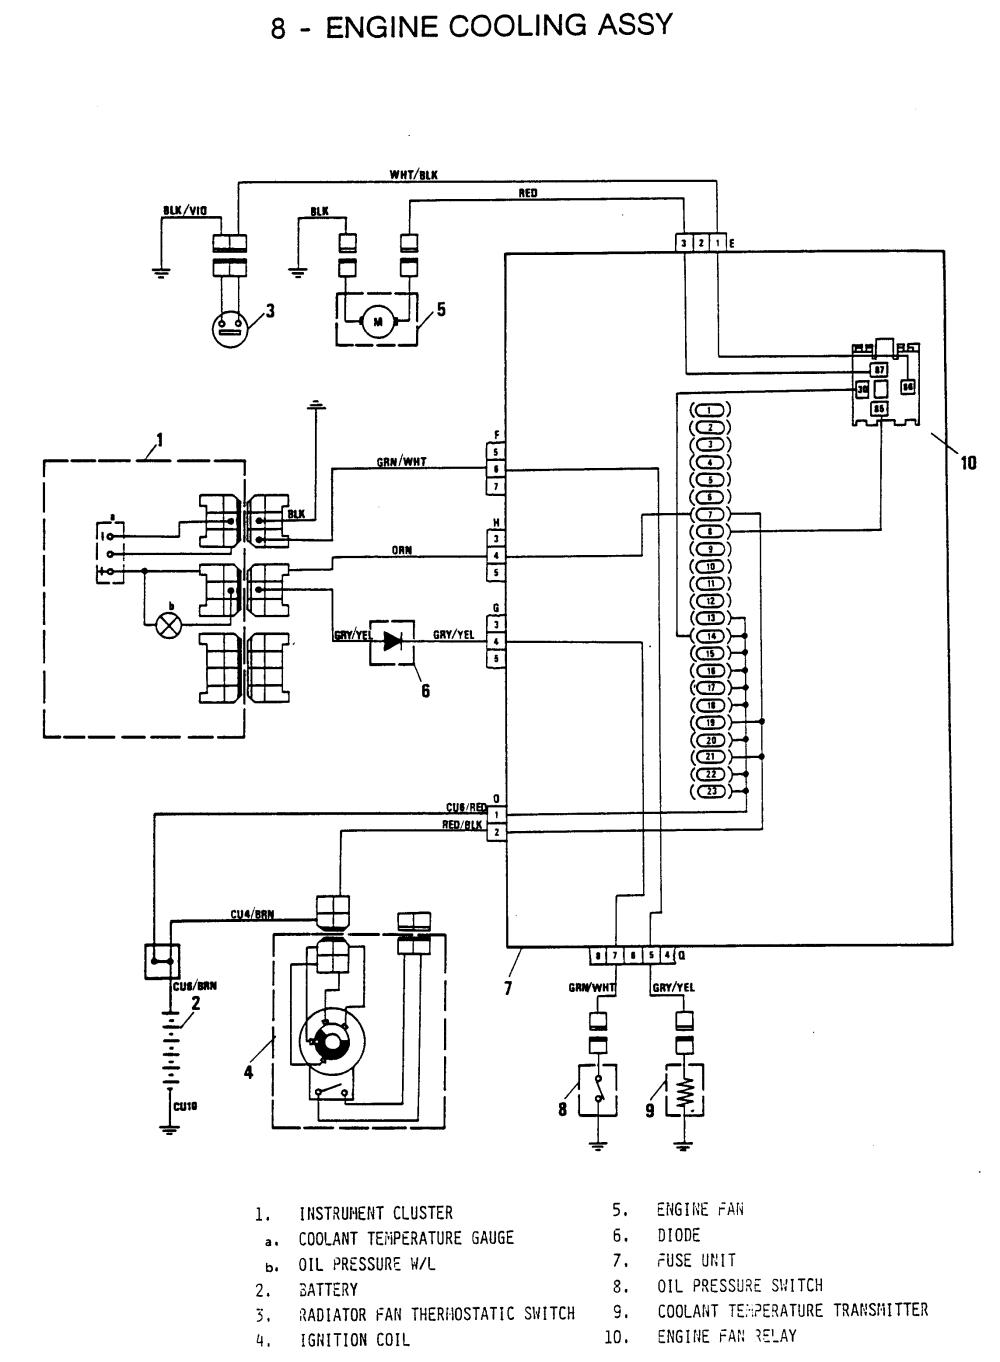 medium resolution of fiat x19 1500 wiring diagram explained wiring diagrams jeep wiring diagram 1978 fiat x19 wiring diagram